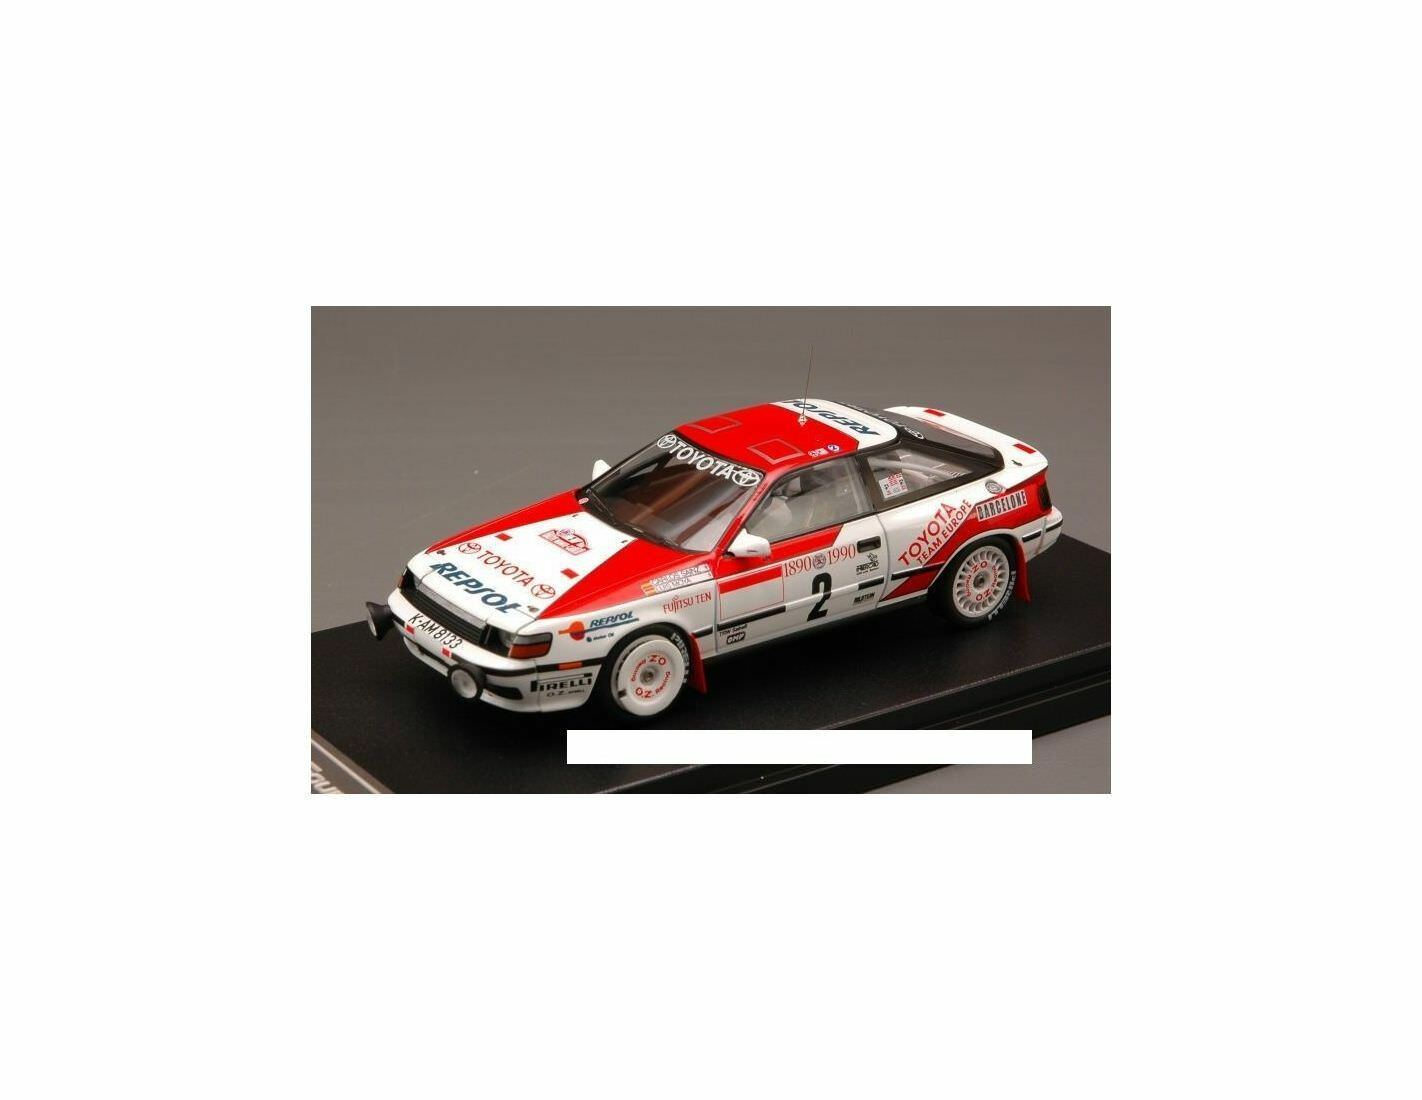 Hpi Racing HPI8572 TOYOTA CELICA GT-FOUR N.2 2nd MONTE CARLO 1990 SAINZ-MOYA 1:4